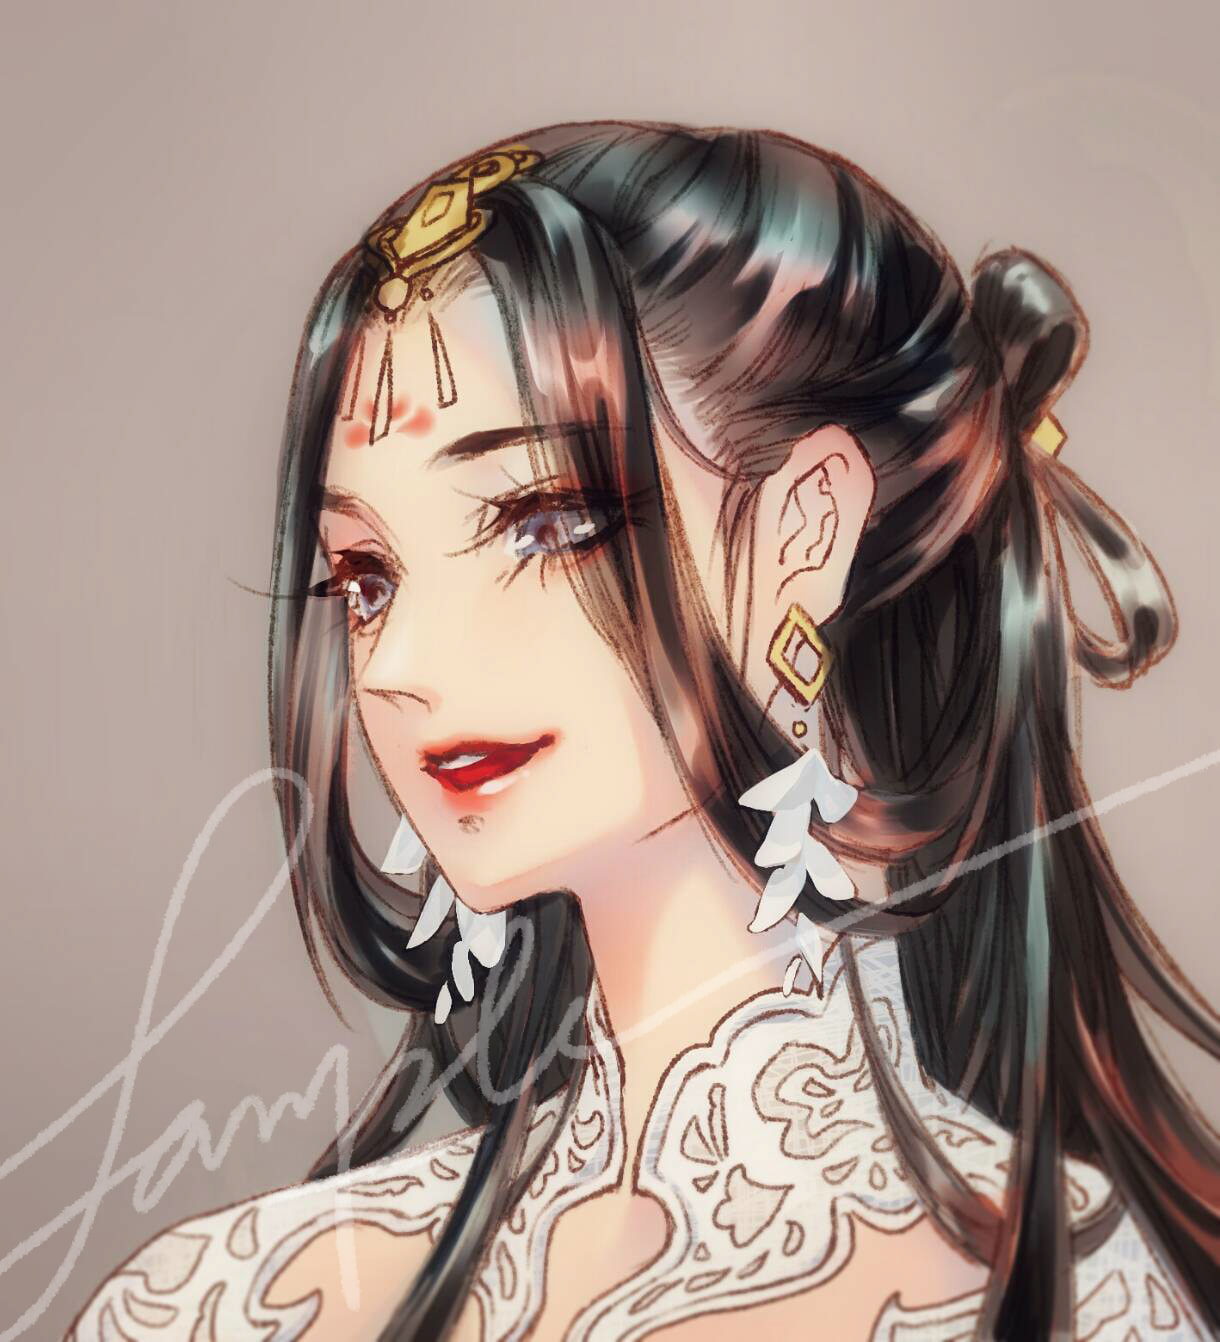 art work by 陌上寒如玉